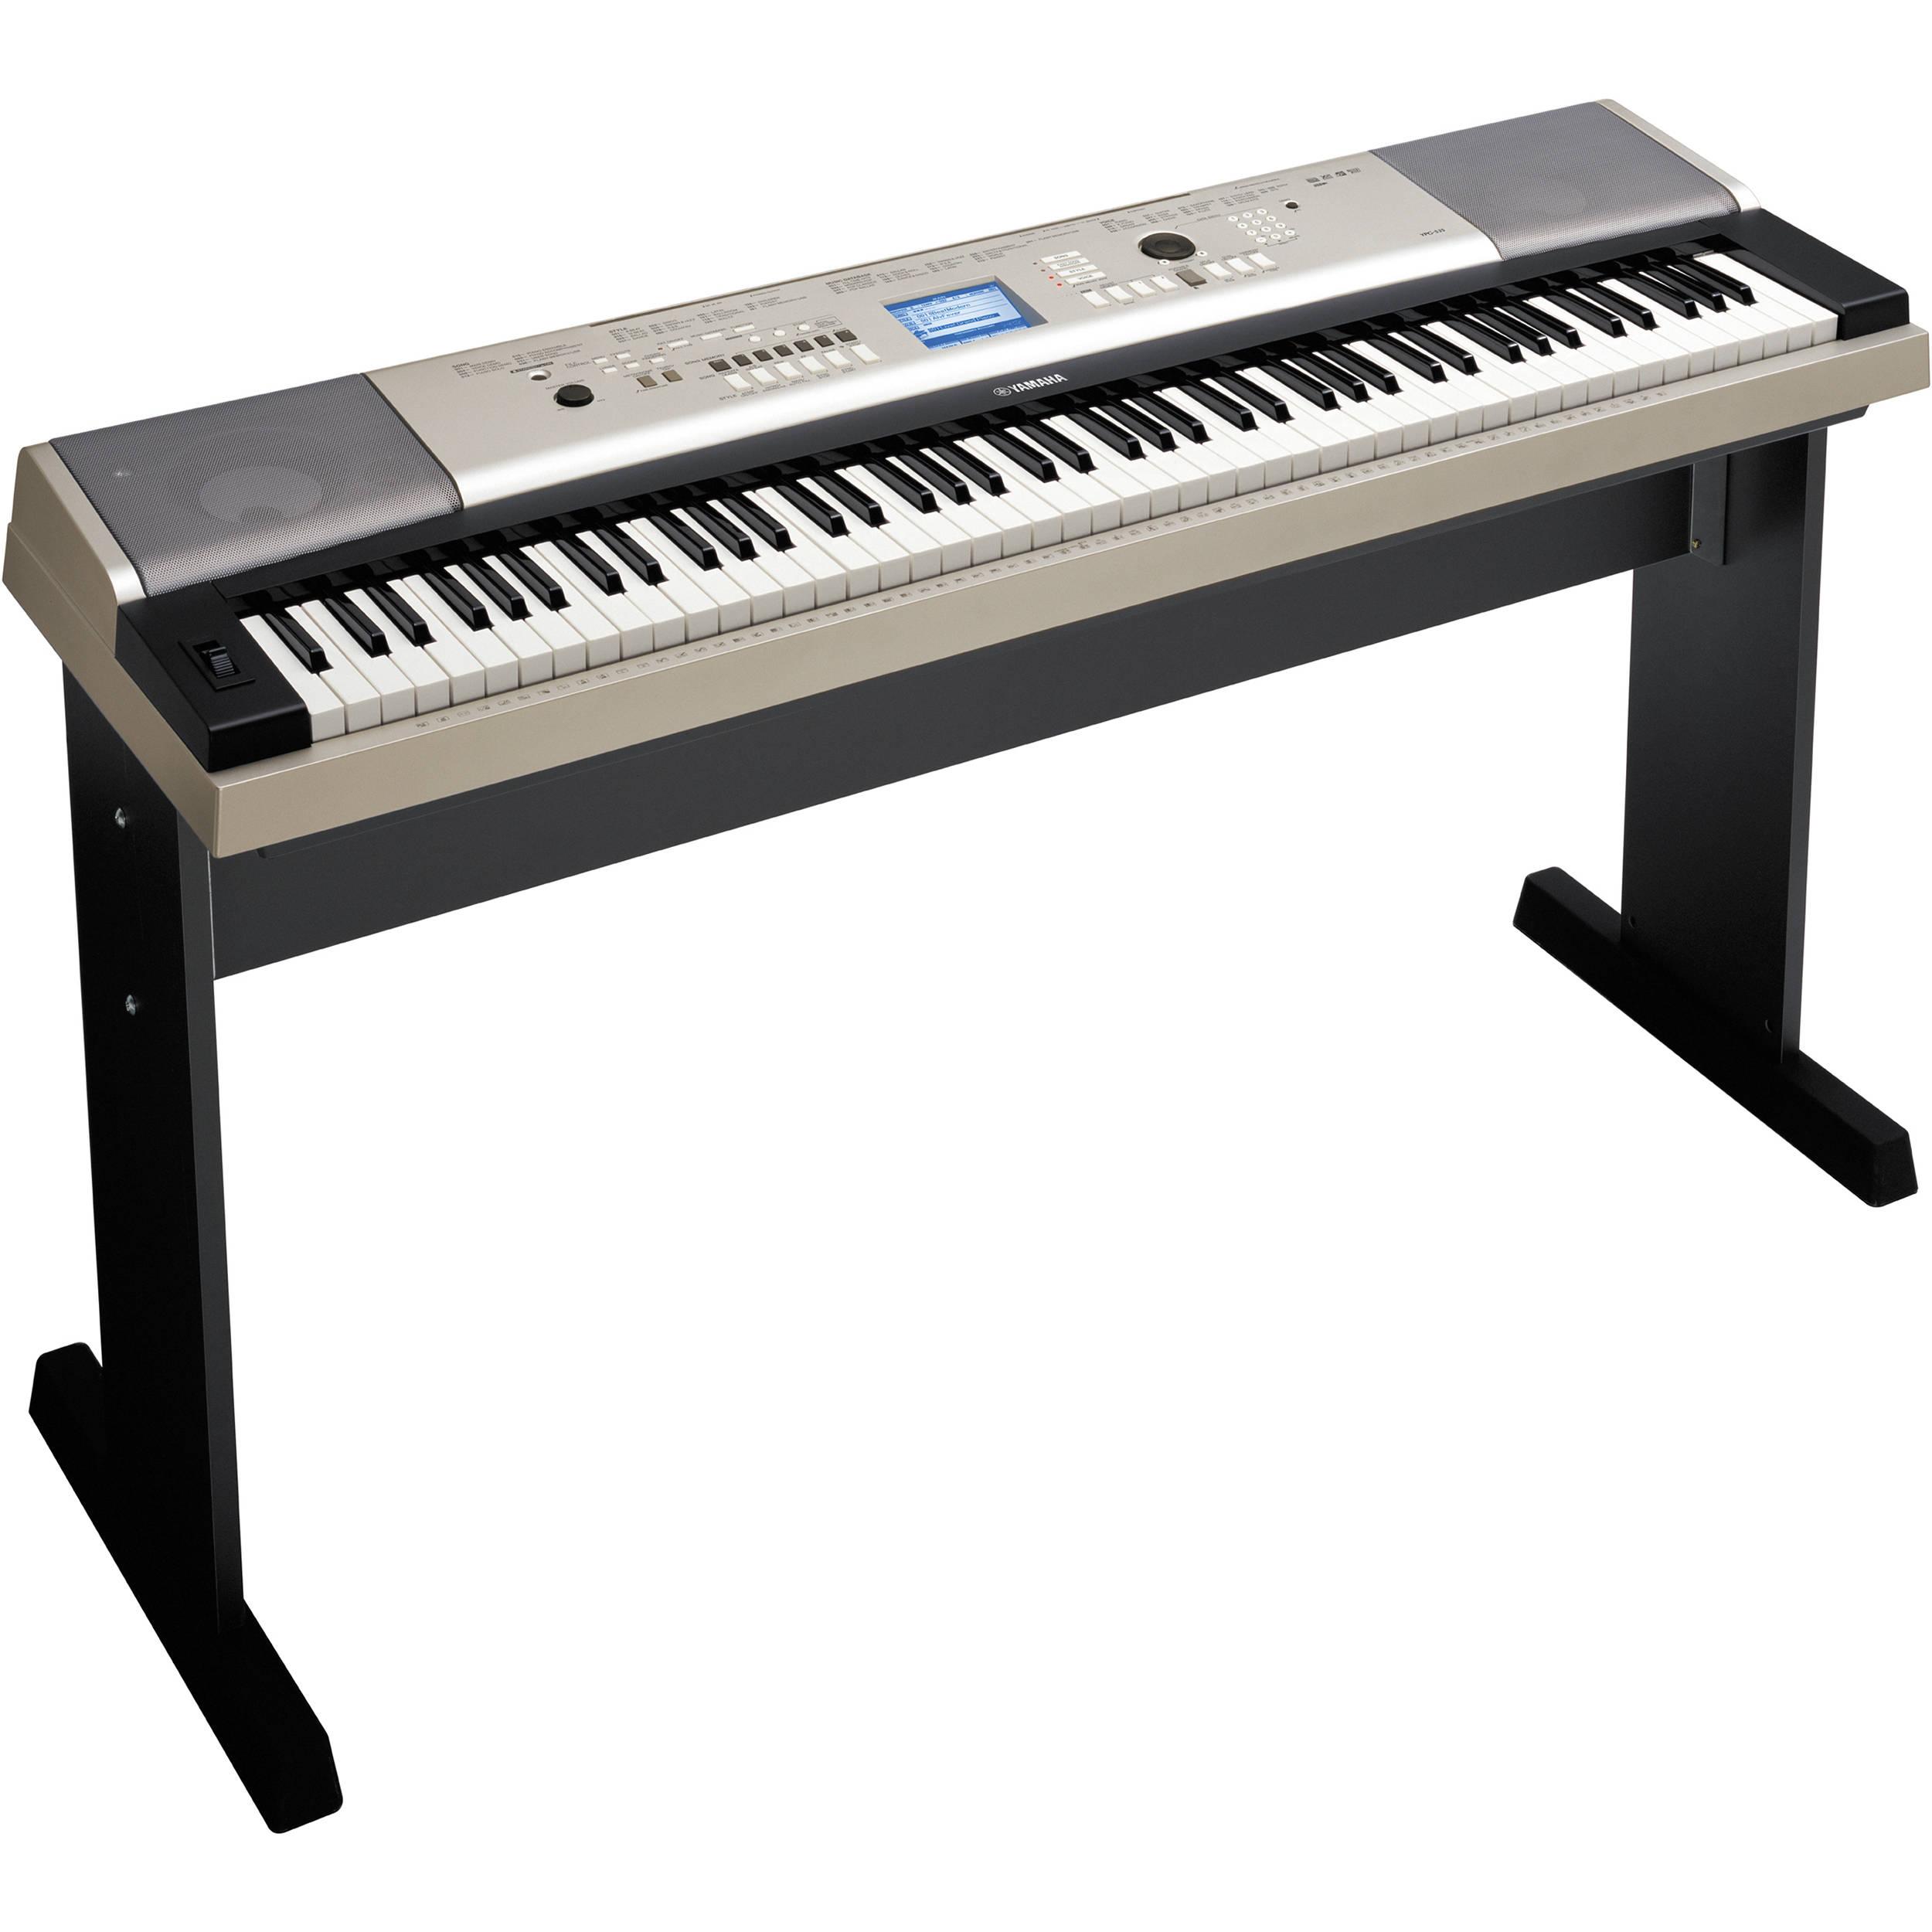 yamaha ypg 535 88 note portable keyboard ypg535 b h photo rh bhphotovideo com yamaha ypg-535 manual Yamaha YPG-535 Keyboard